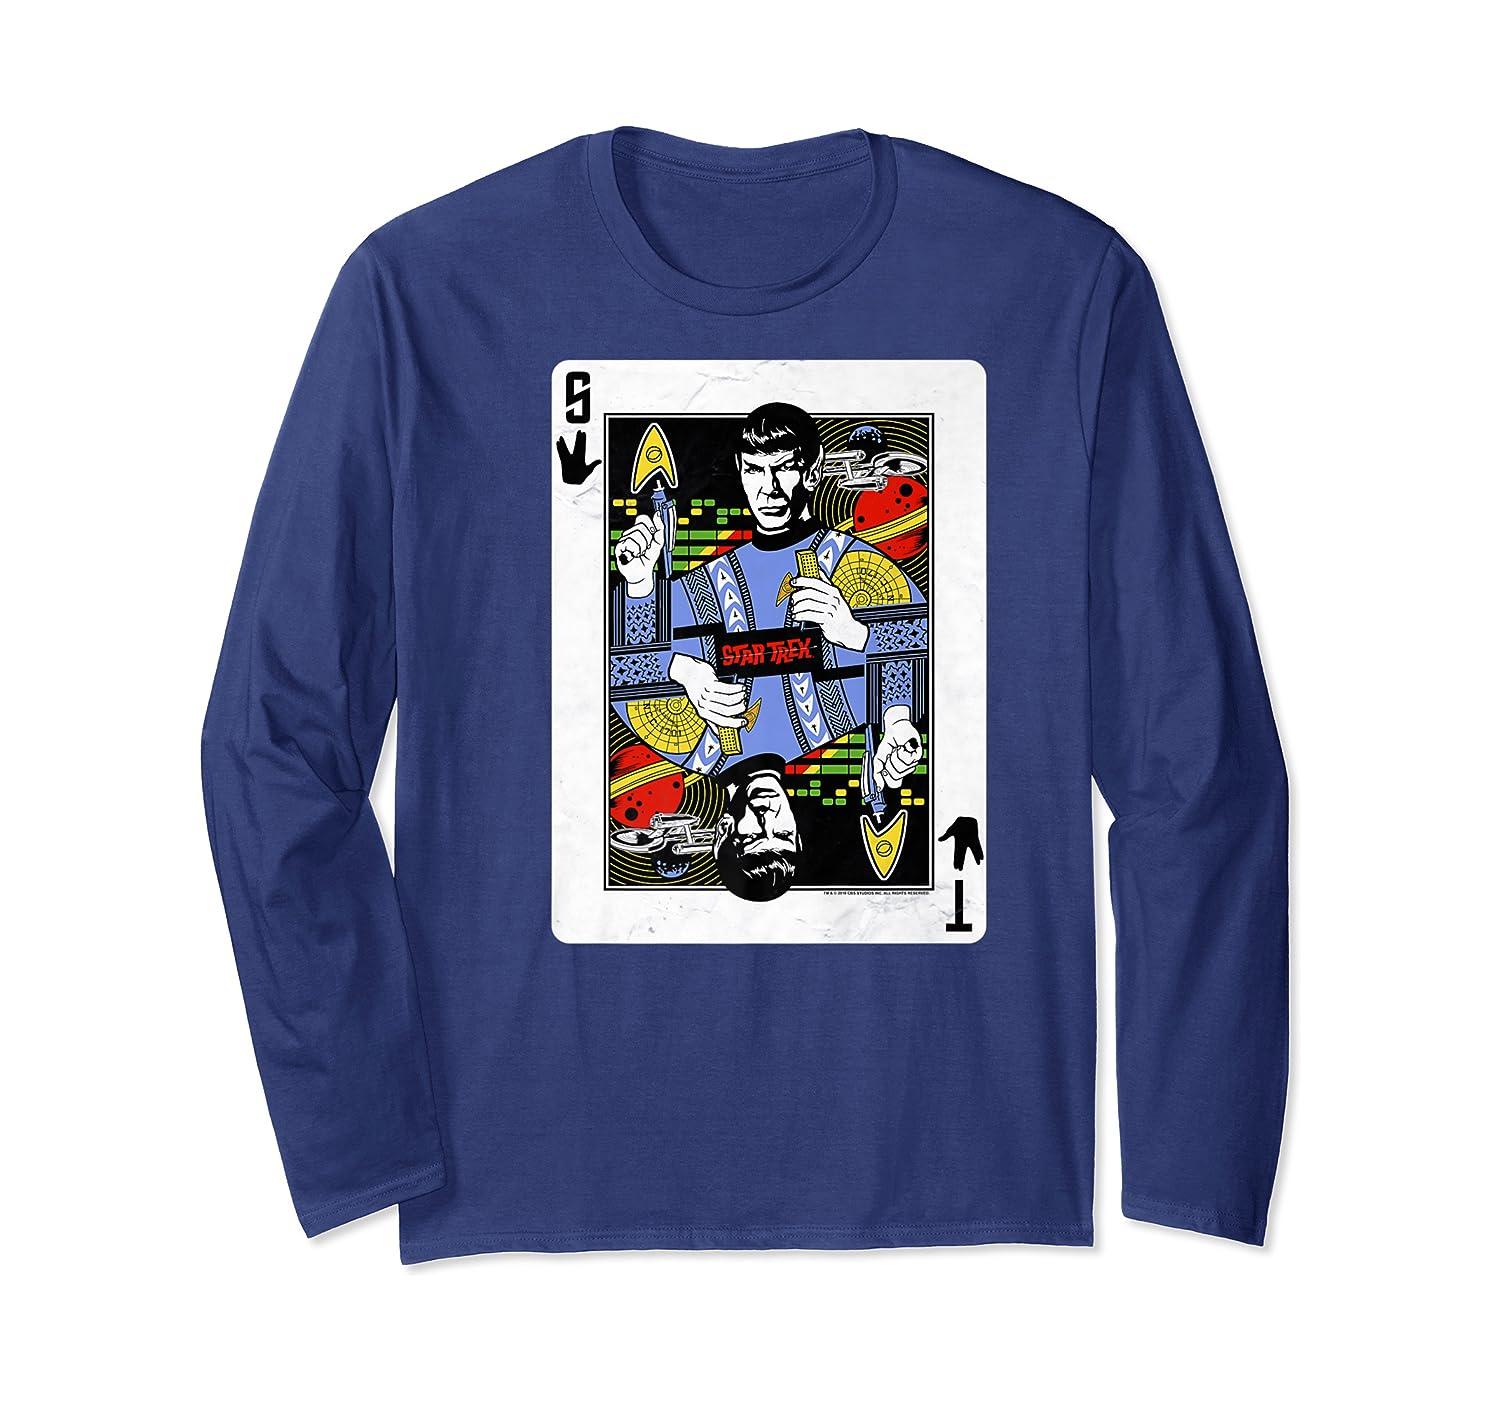 Star Trek Original Series Spock Playing Card Shirts Long Sleeve T-shirt